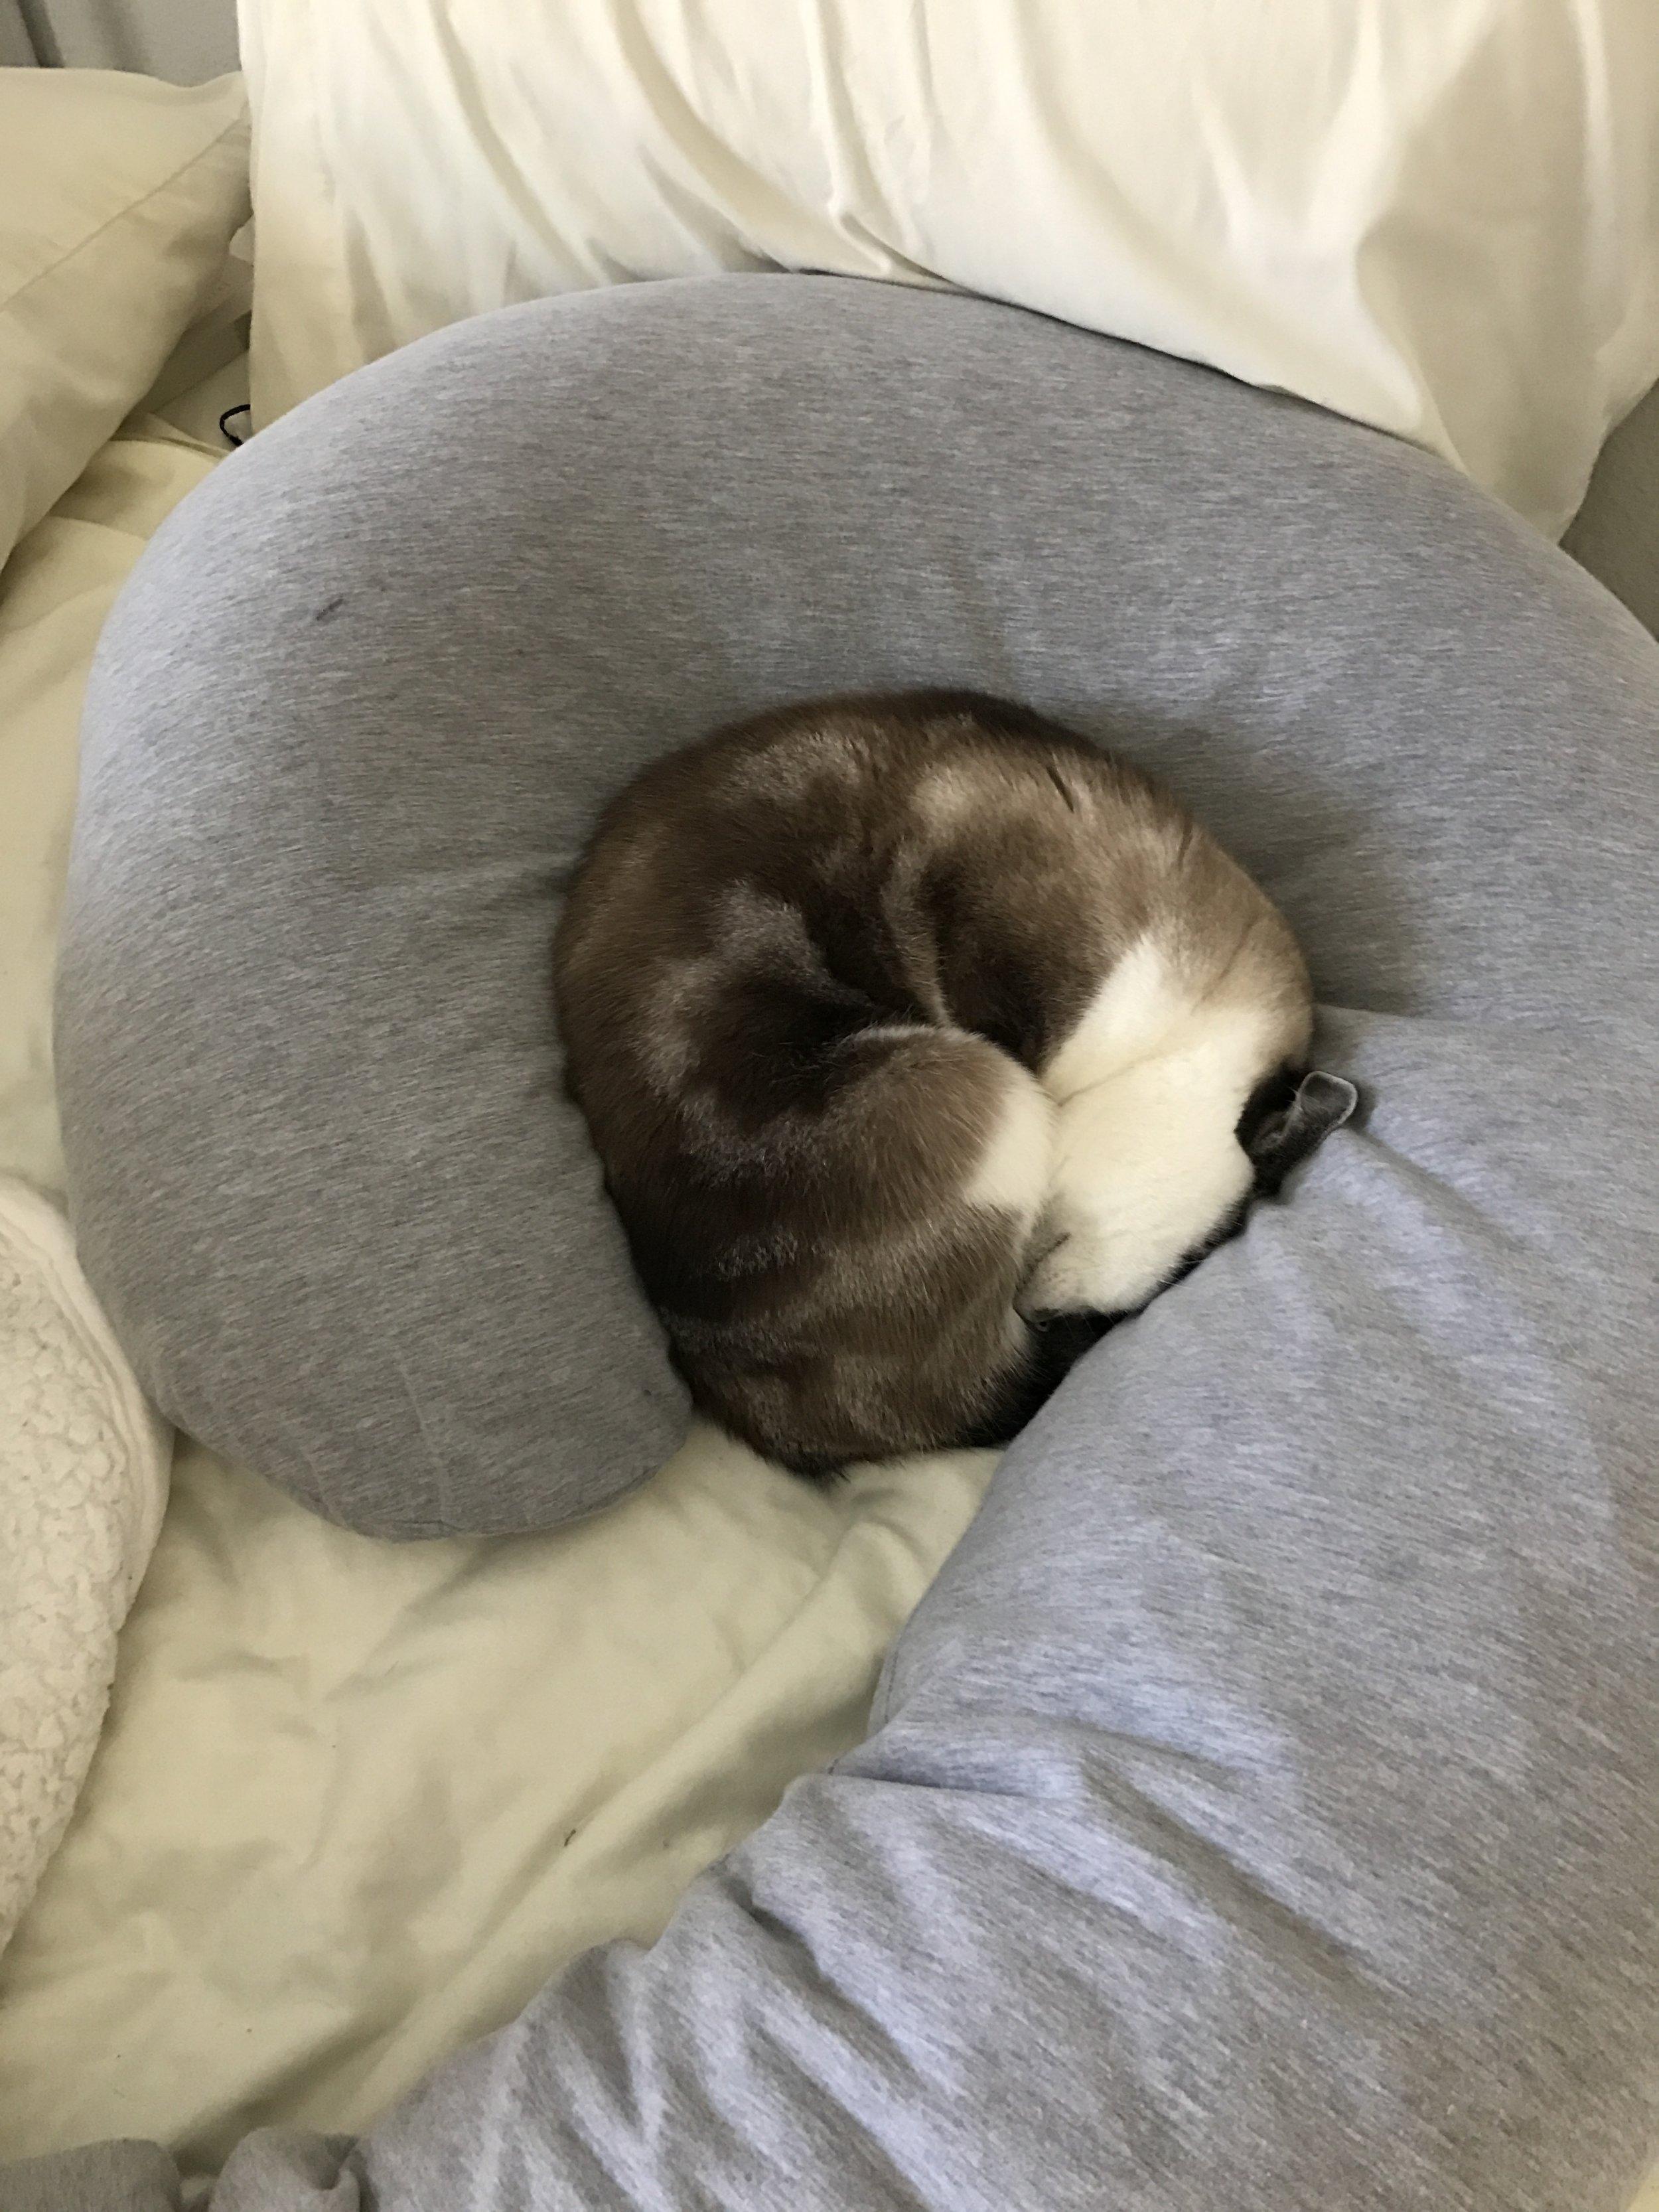 Even my pregnancy pillow isn't safe!